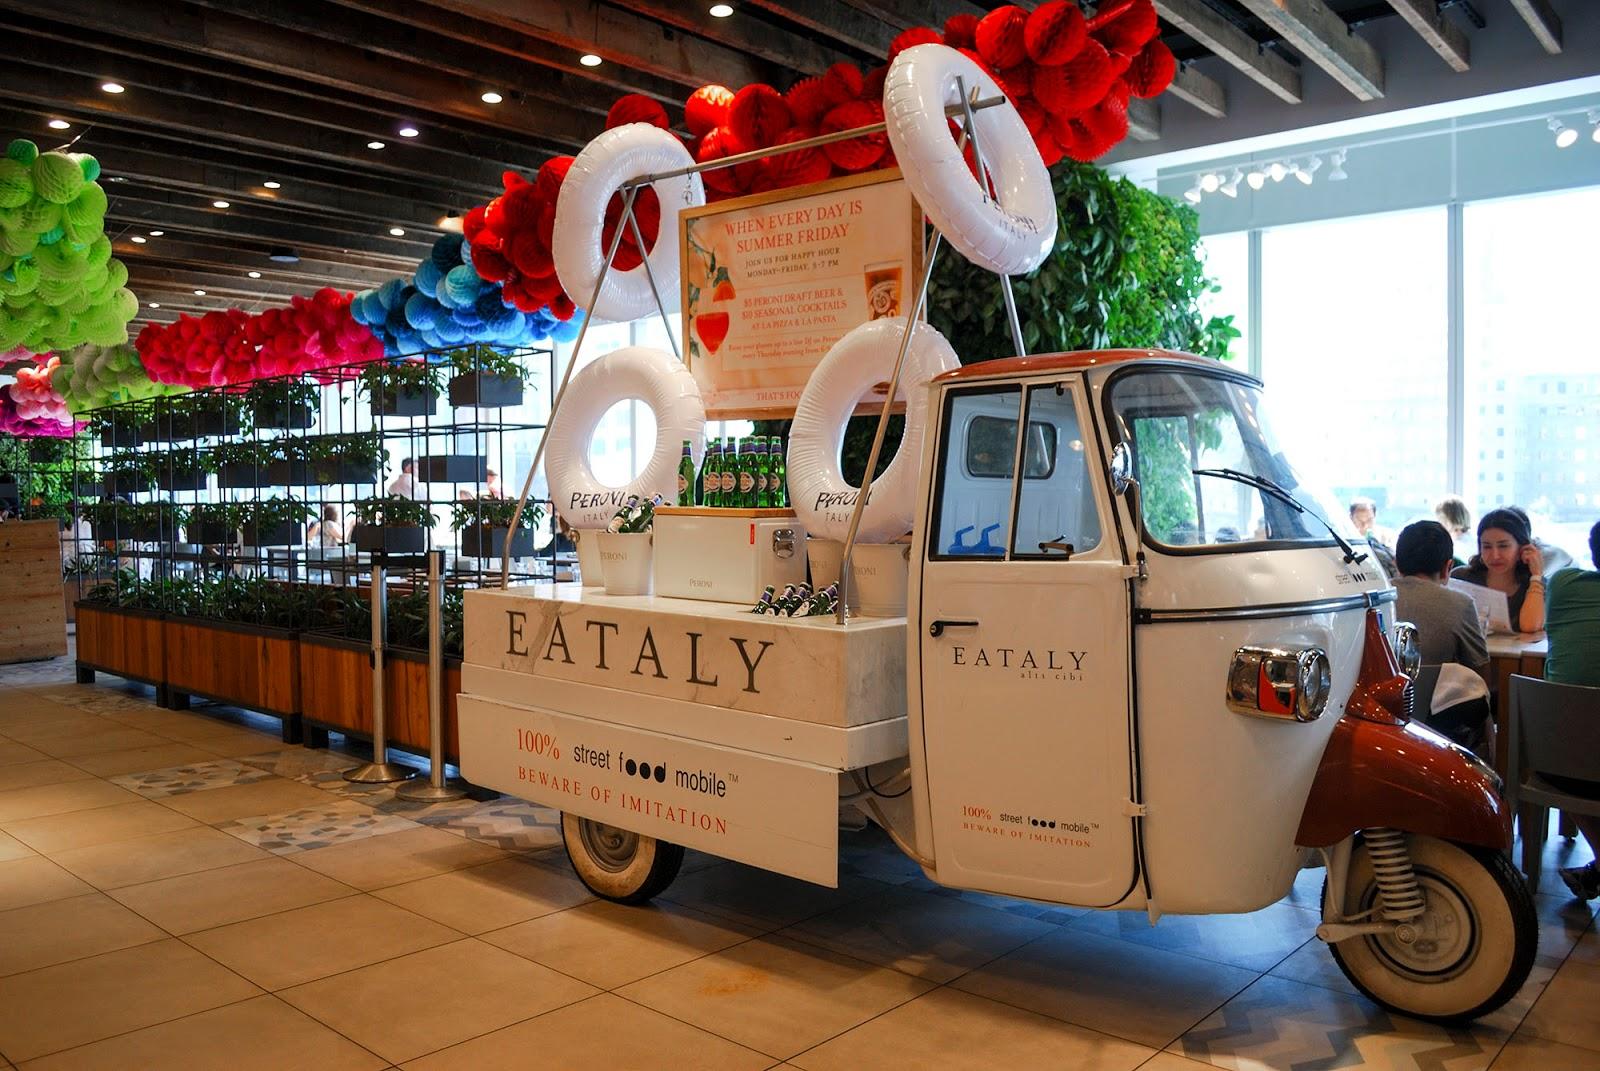 new york itinerary guide plan eataly westfield wtc food market restaurant manhattan